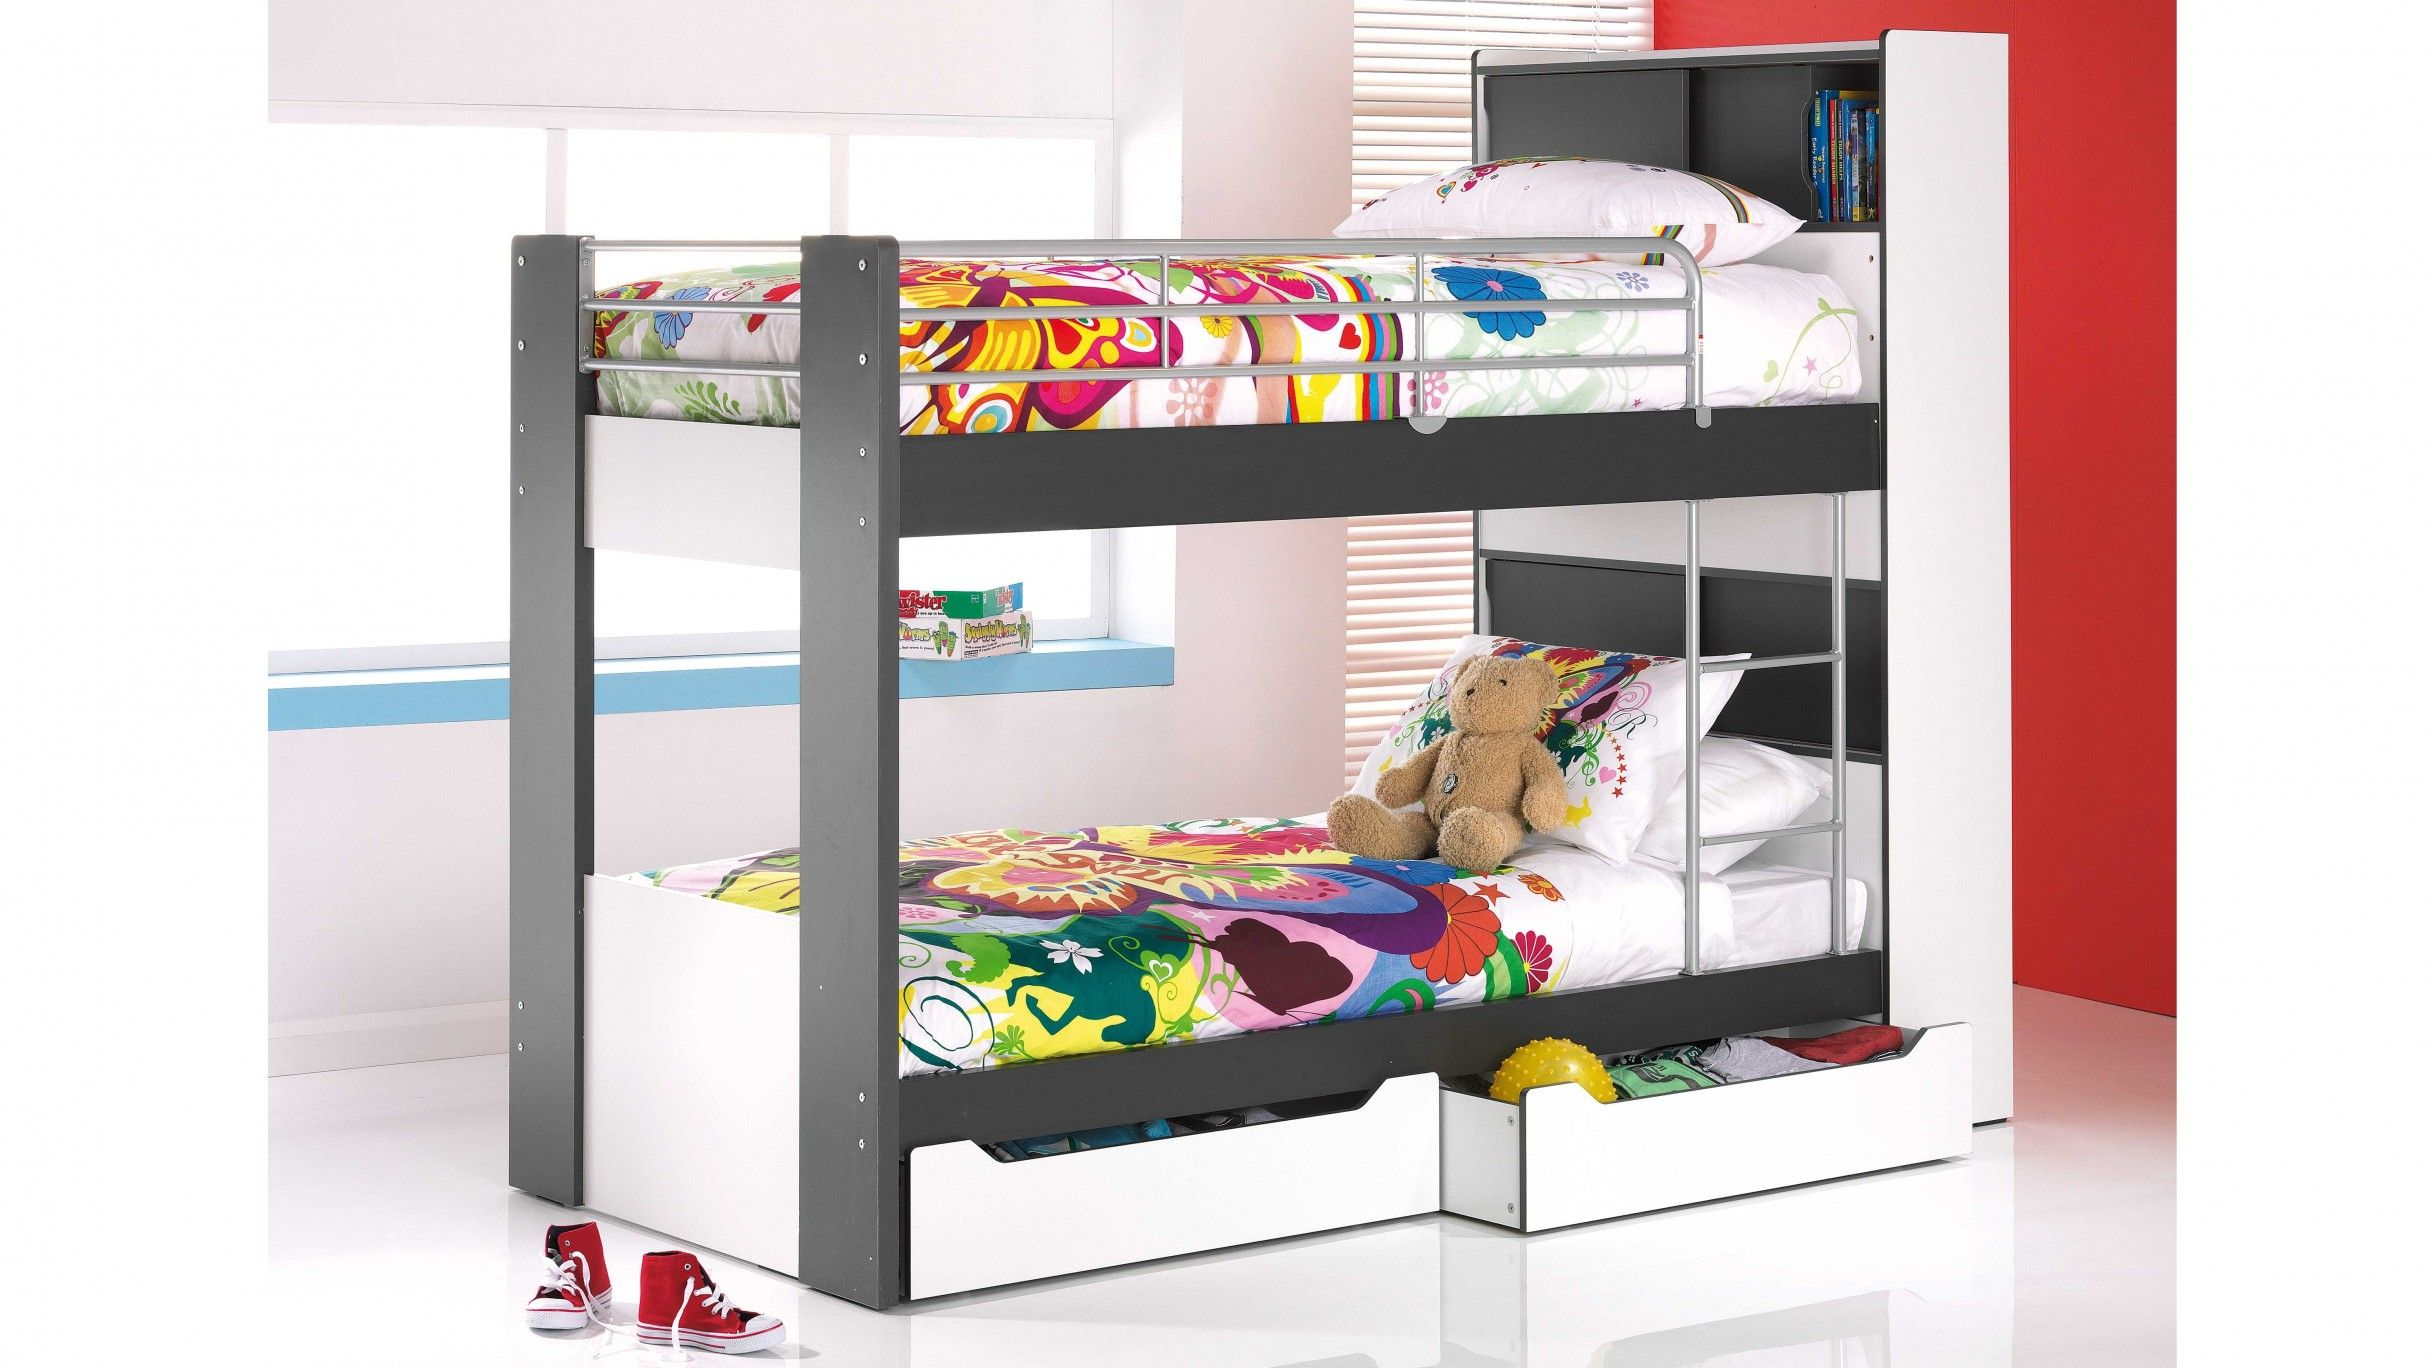 Pin by Yajan Taneja on Bunk bed Bunk beds, Cool bunk